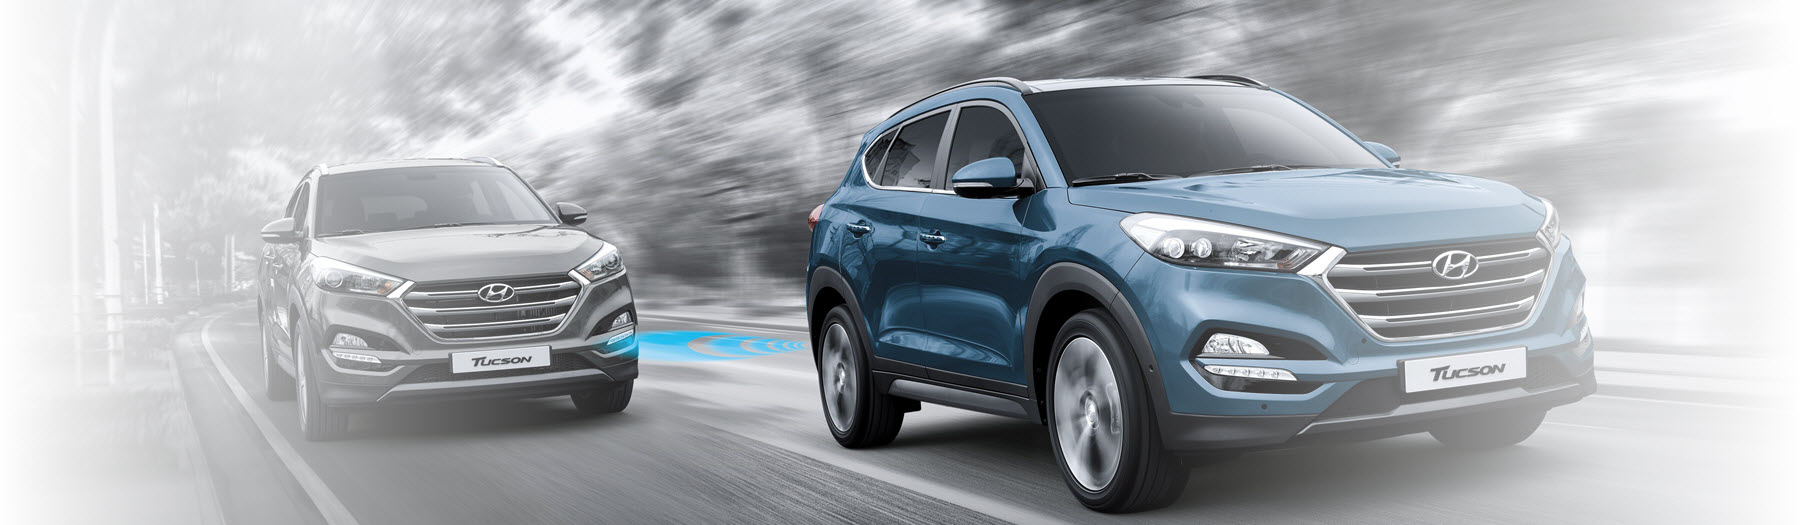 Hyundai kia motor finance company retail - Press Releases